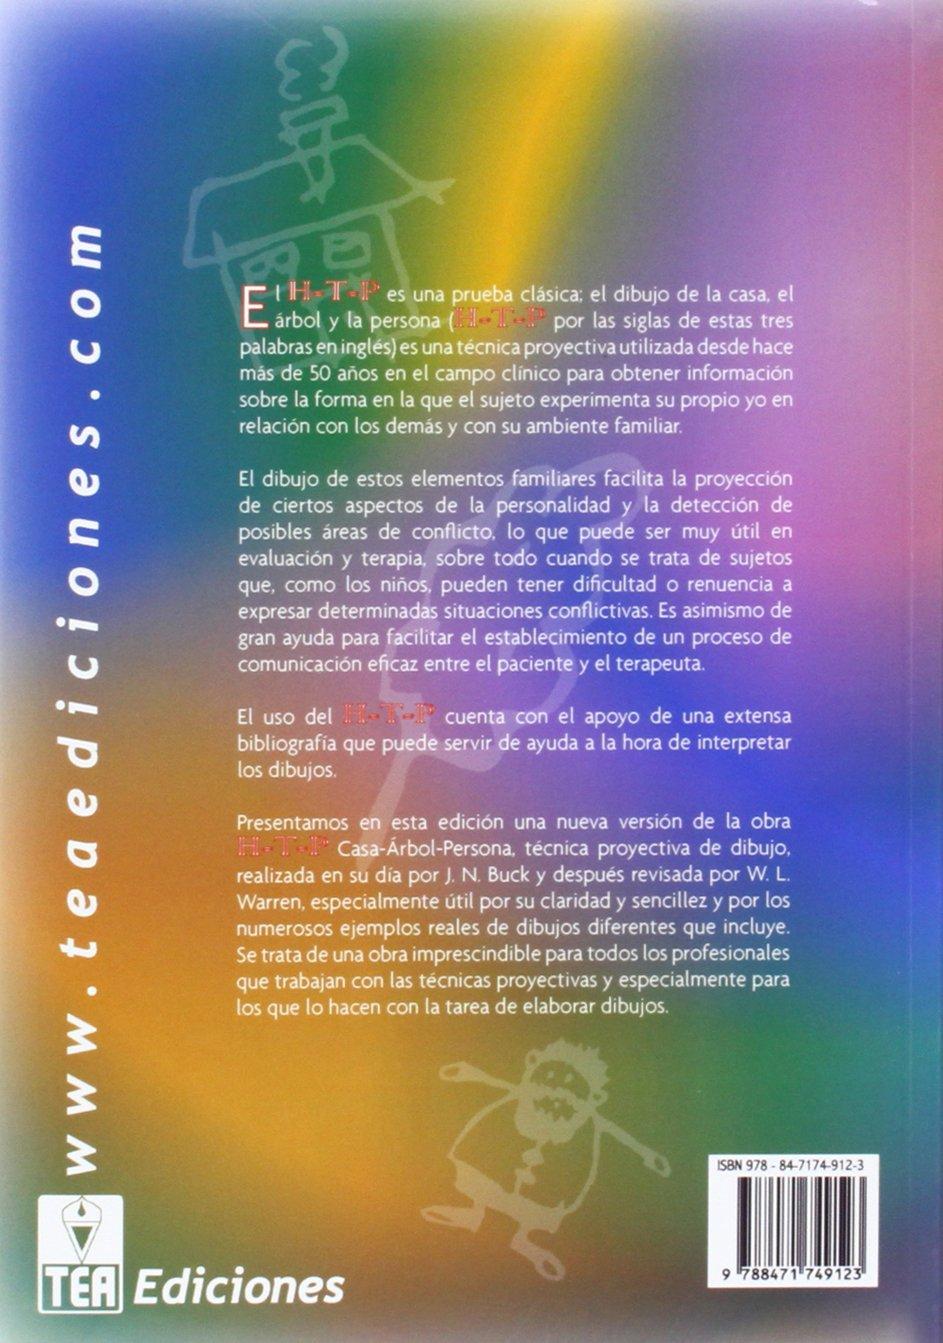 H-T-P (CASA-ARBOL-PERSONA). MANUAL Y GUIA DE INTERPRETACION: 9788471749123: Amazon.com: Books